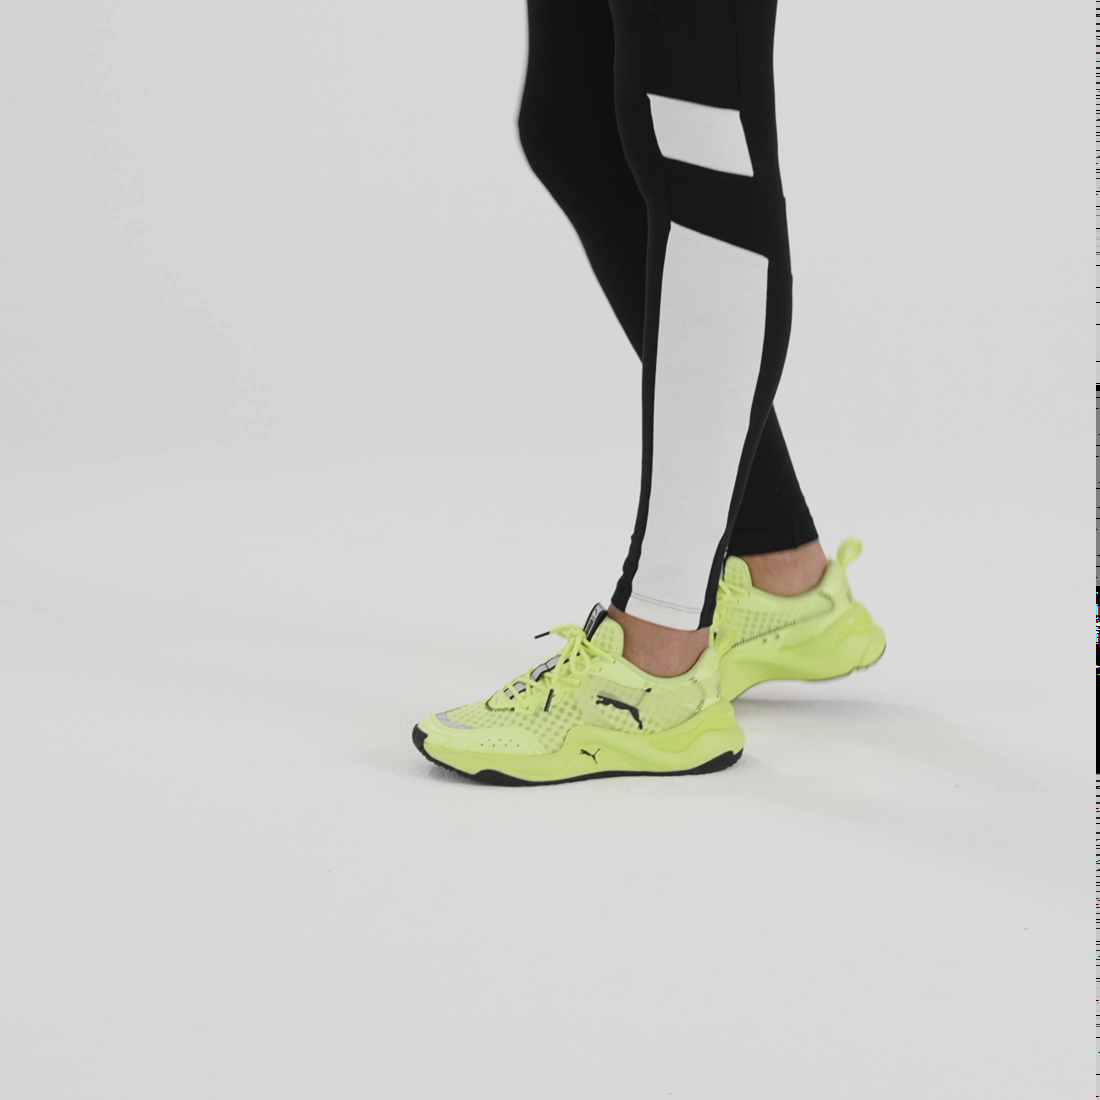 Image PUMA Rise Neon Women's Sneakers #8